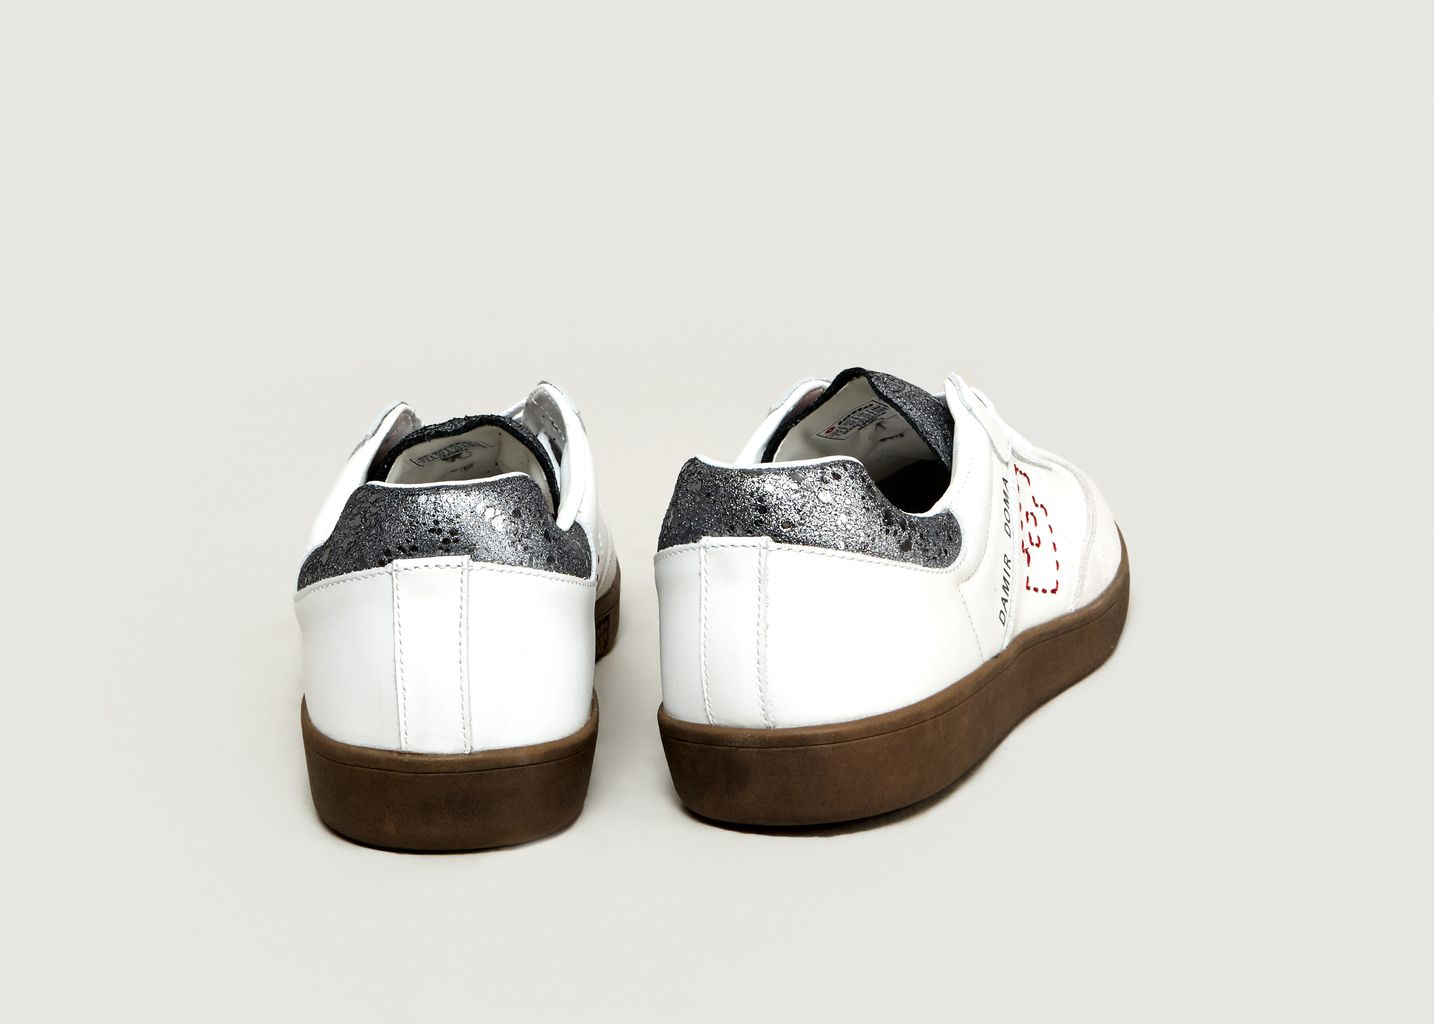 Sneakers Brazil Select DD - Damir Doma x Lotto